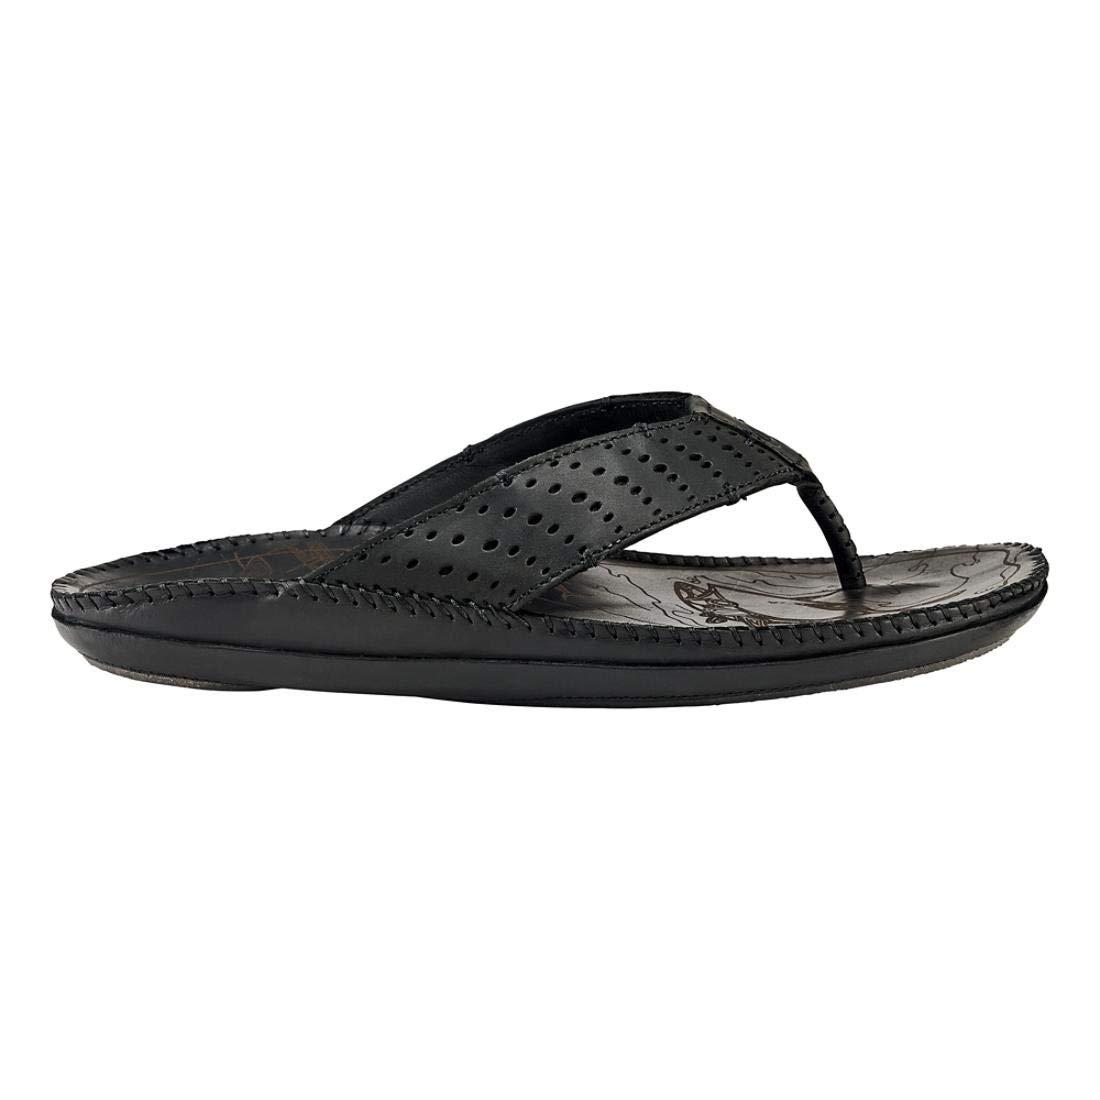 Black Black OluKai Men's Hoe Sandals